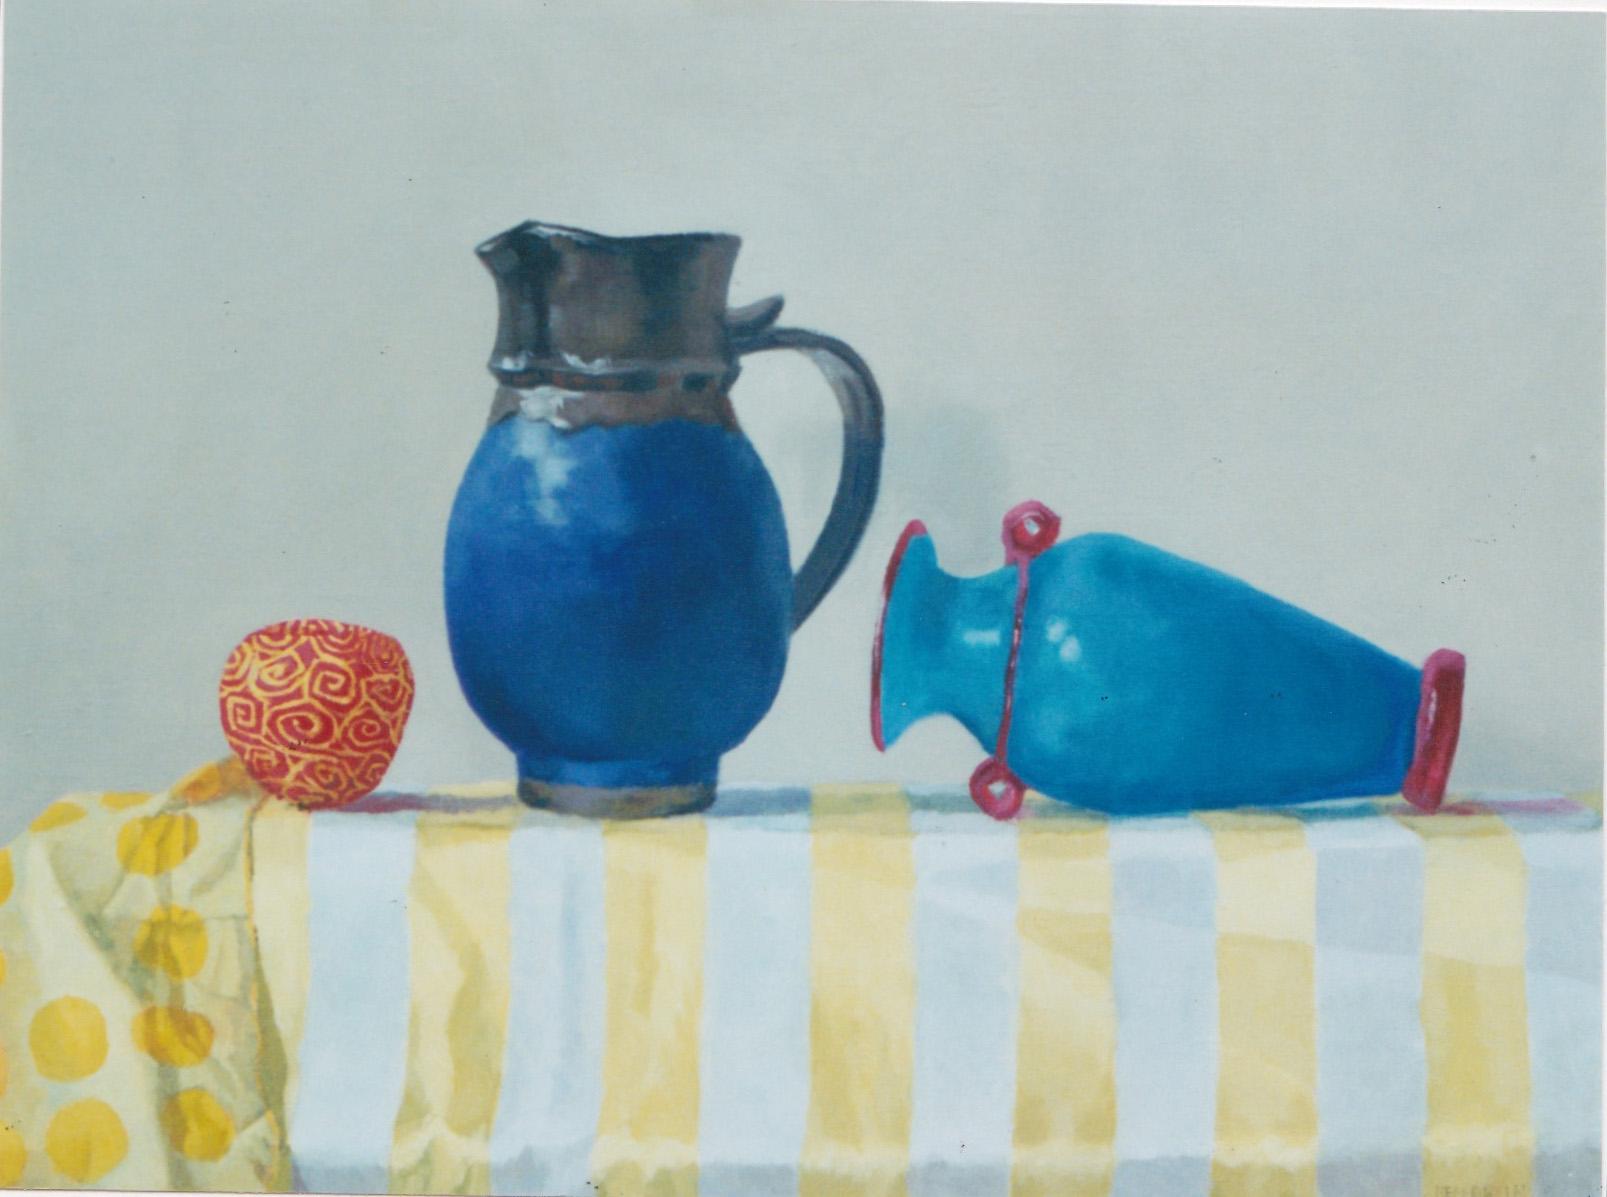 Primary Colors by  Melissa Hefferlin - Masterpiece Online